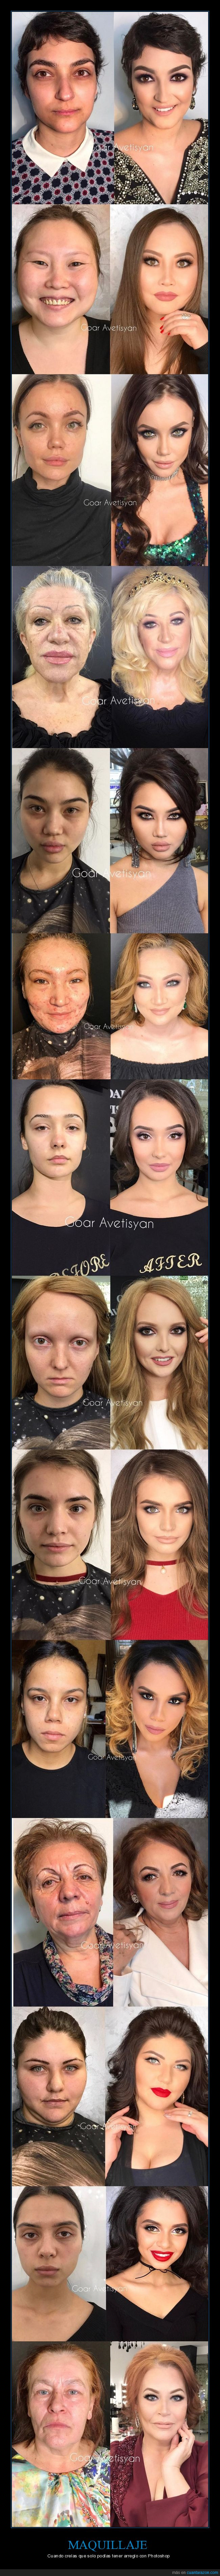 maquilladora,maquillaje,photoshop